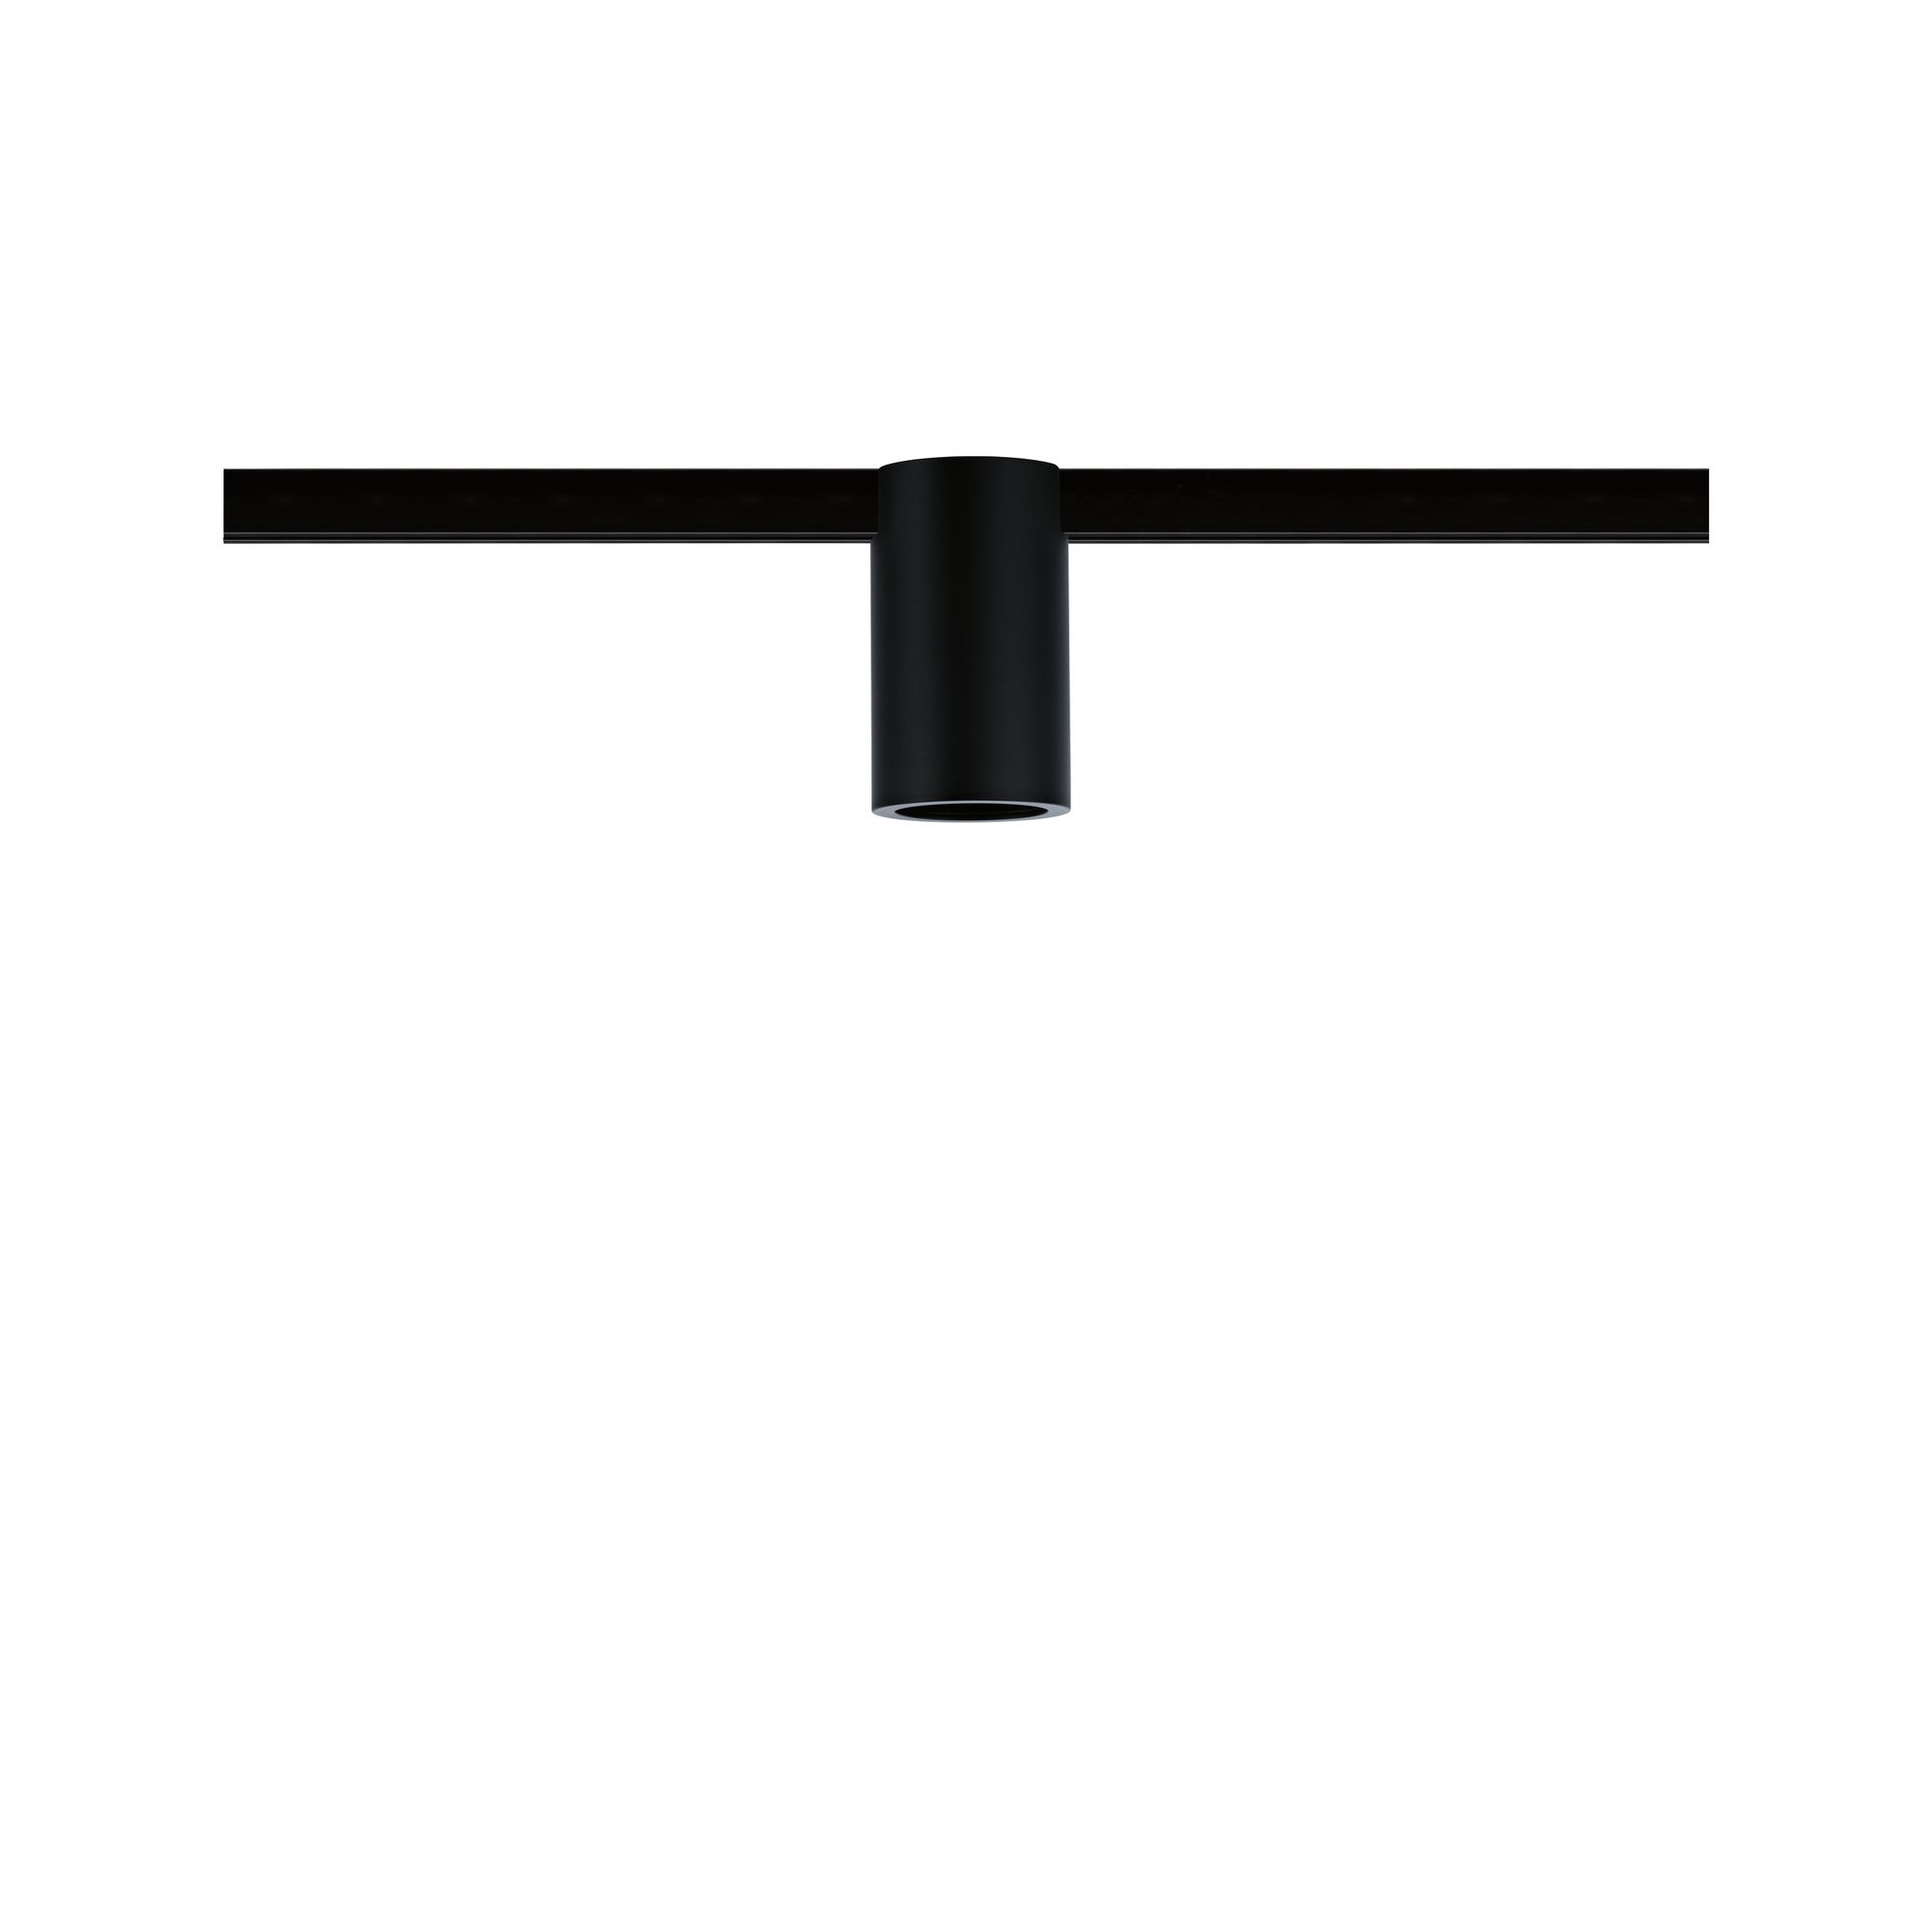 Paulmann URail Spot Ceiling Socket Schwarz max. 1x20W E27 dimmbar ohne Leuchtmittel